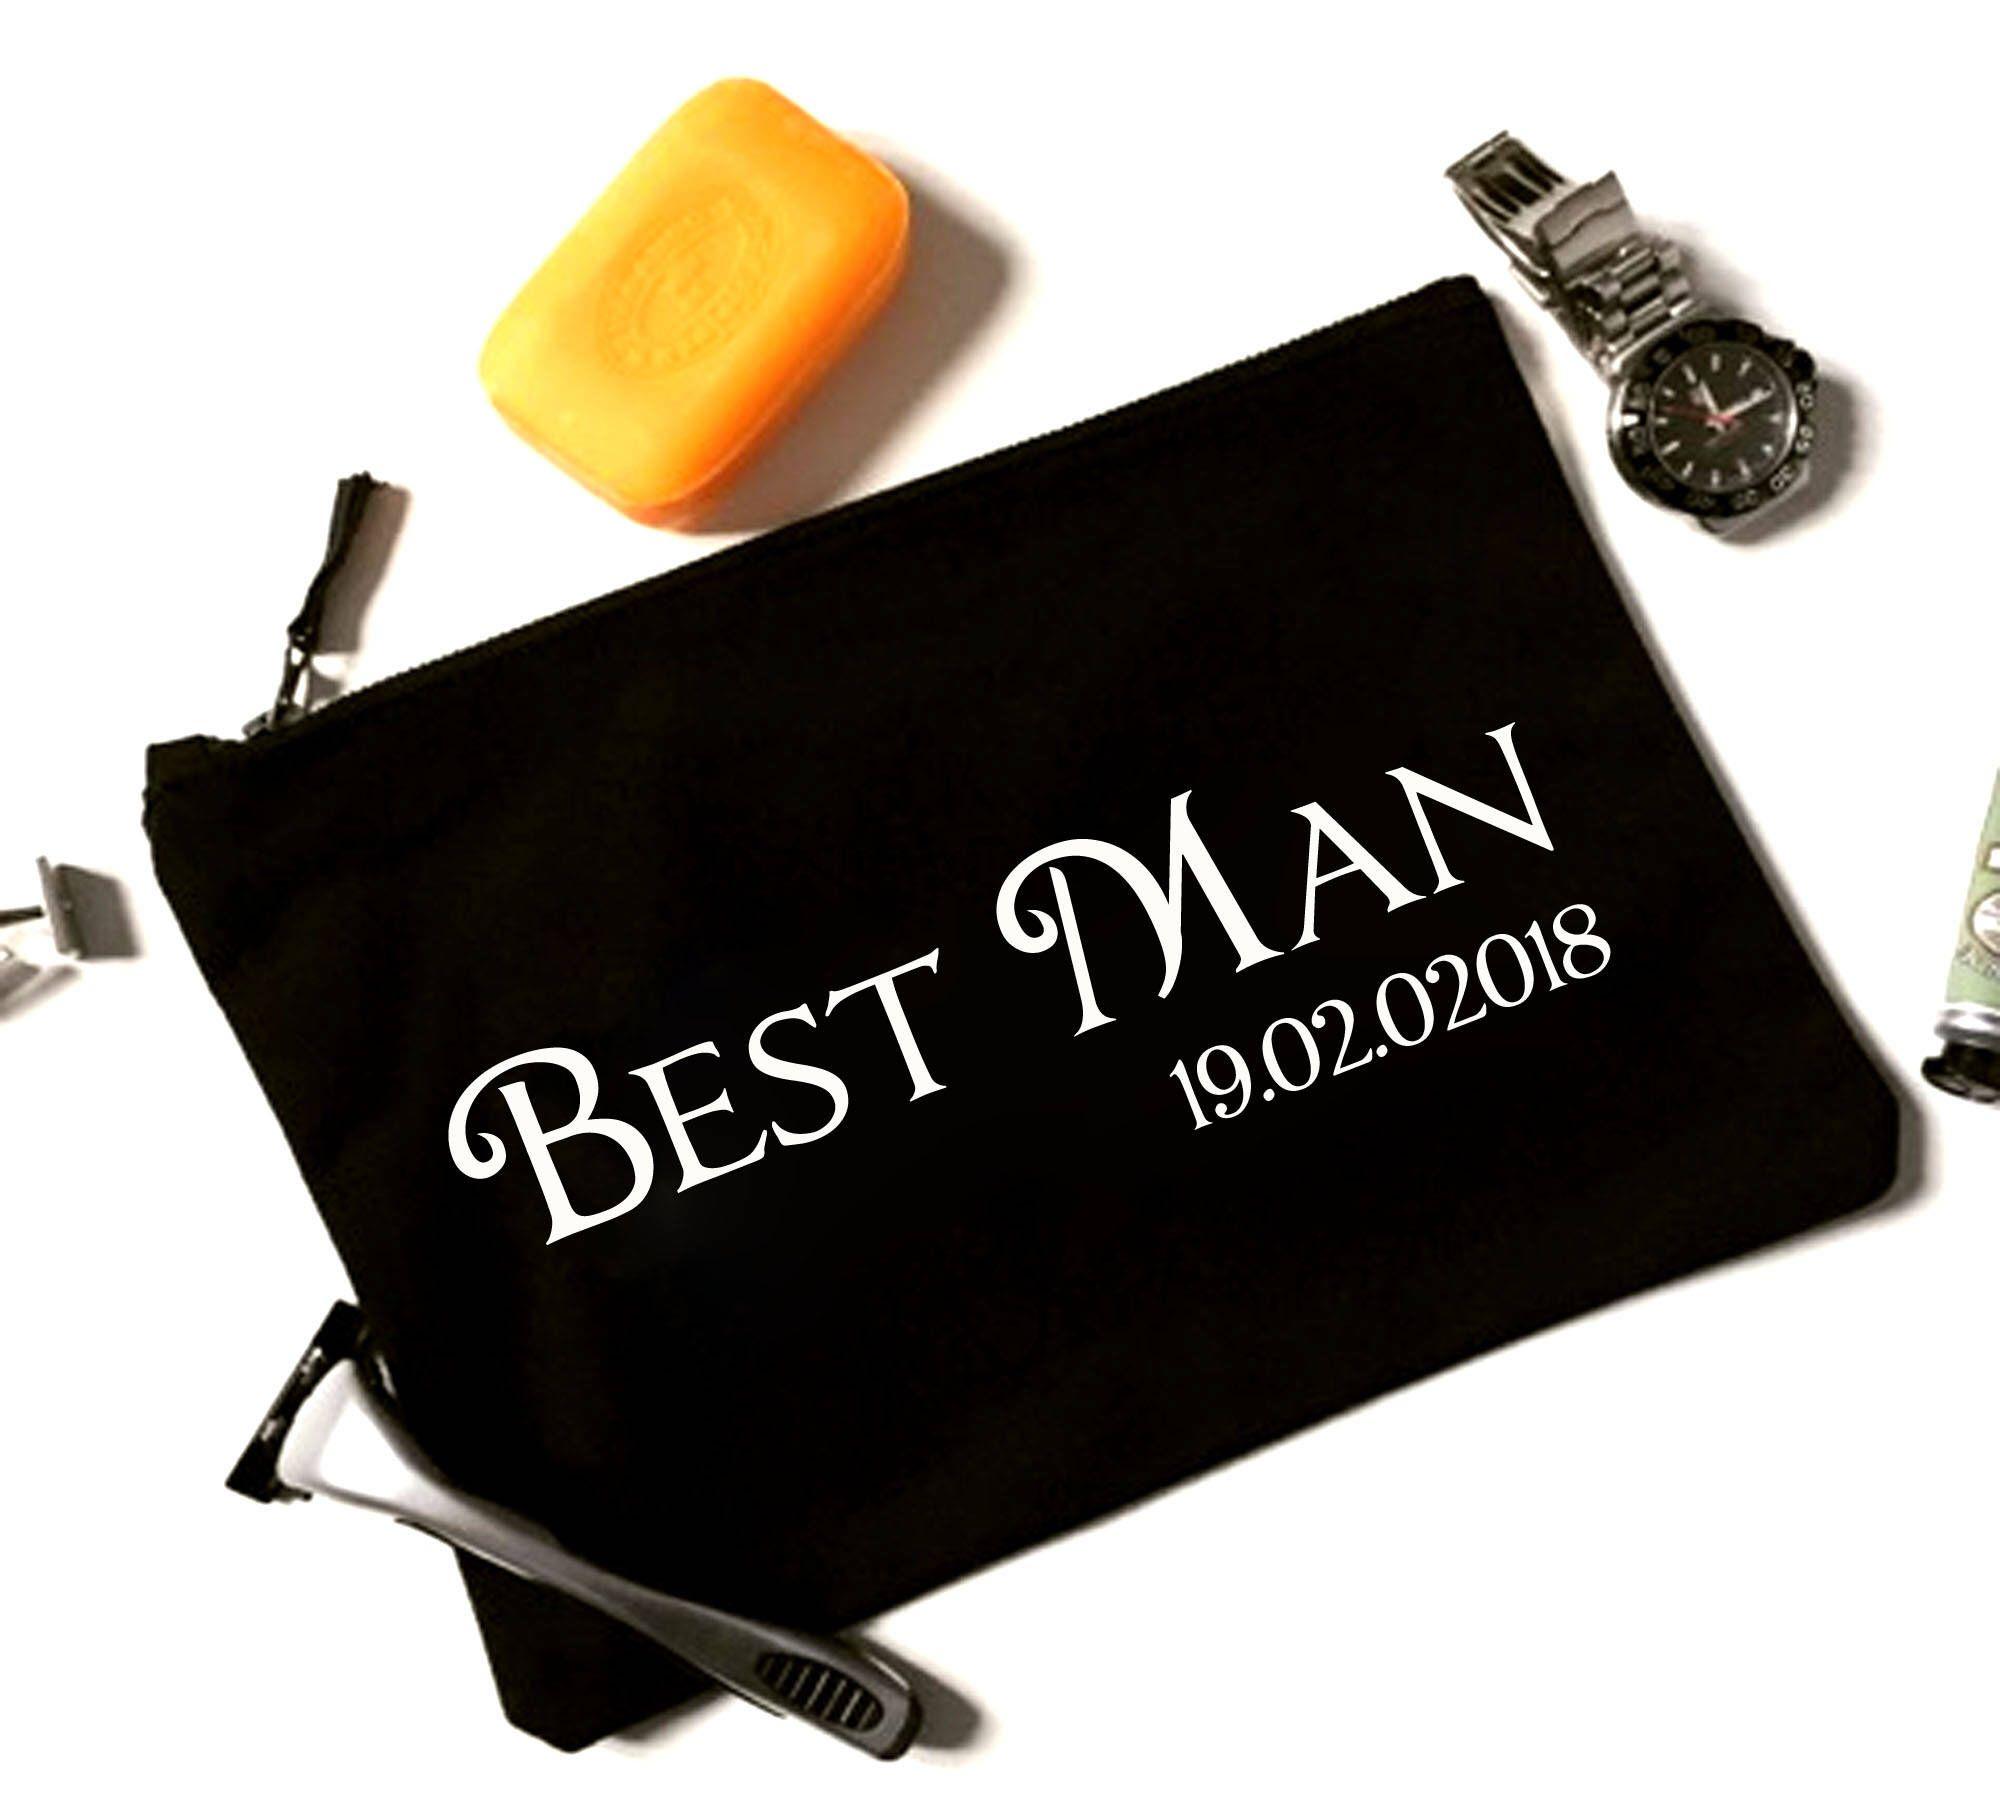 Wedding Gift From Groomsmen: Groomsmen Bag, Best Man Thank You Gift, Groomsmen Present